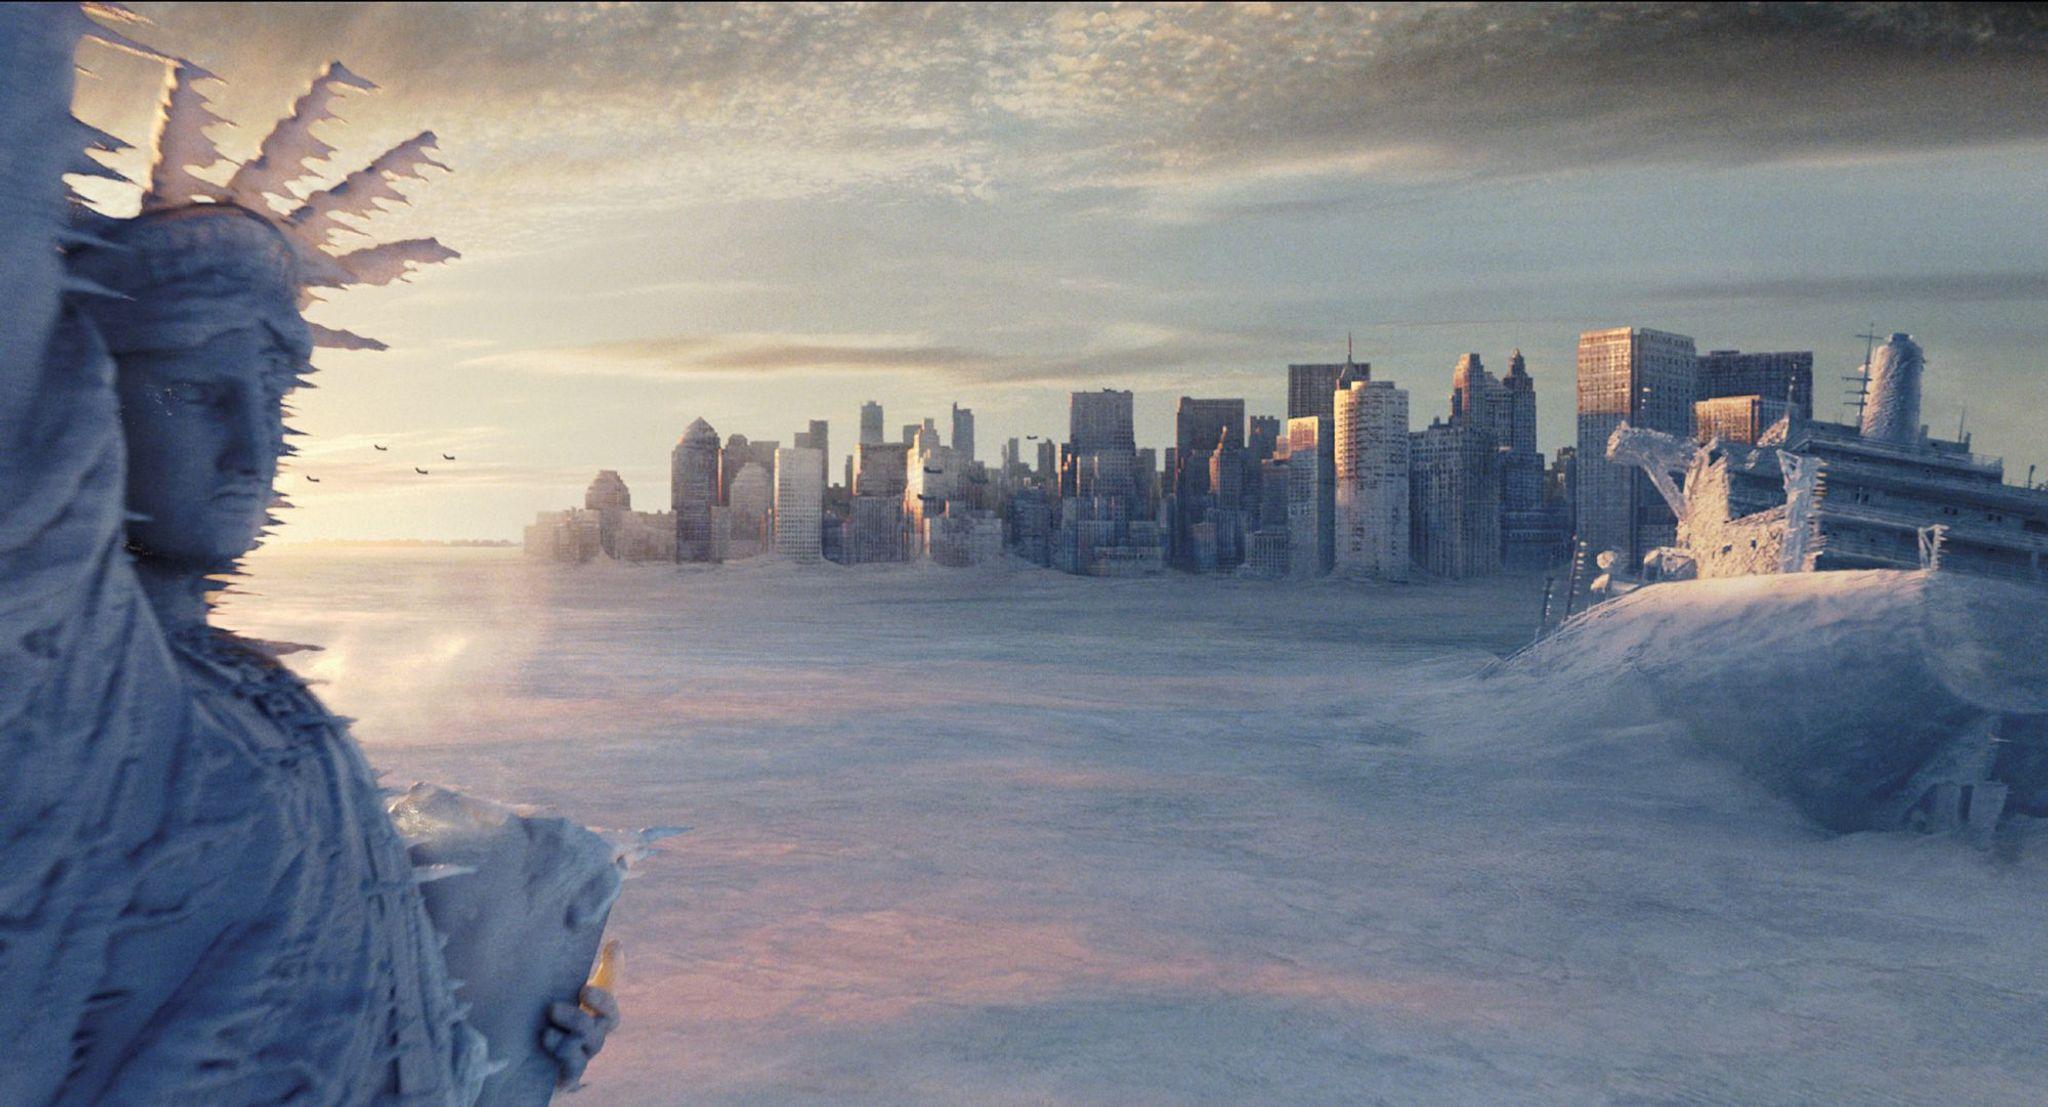 'Climate Hustle' debuts as skeptics take on global-warming 'consensus'